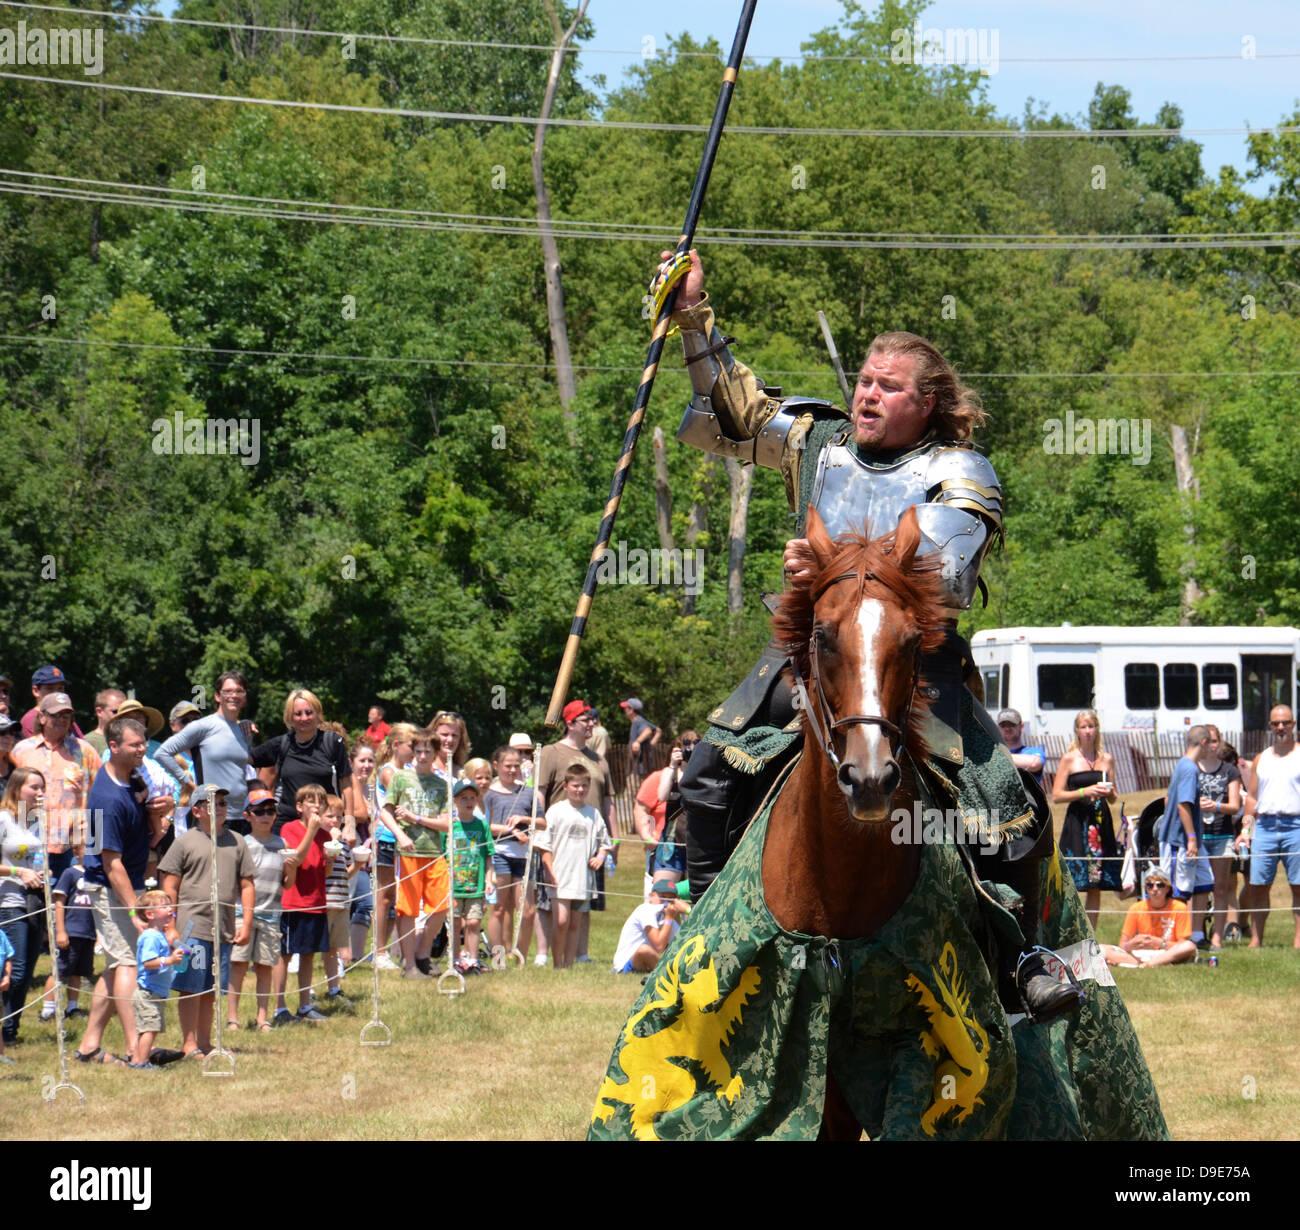 SALINE, MI - JULY 14: Victorious jouster at the Saline Celtic Festival July 14, 2012 in Saline, MI. Stock Photo